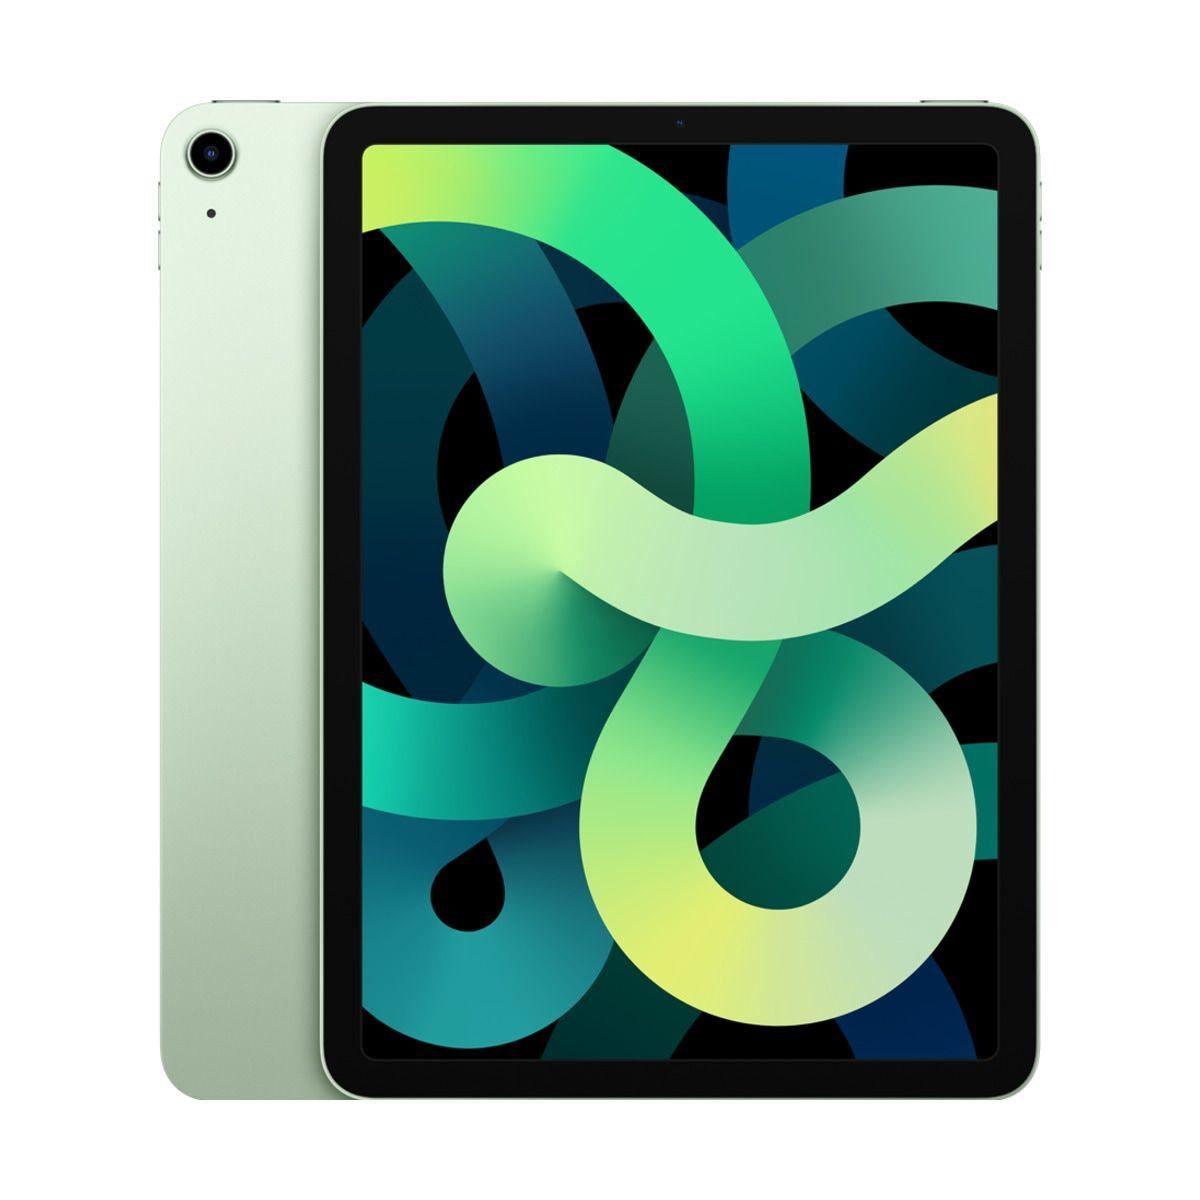 Apple iPad Air Wi-Fi + Cell 64GB - Green / SK